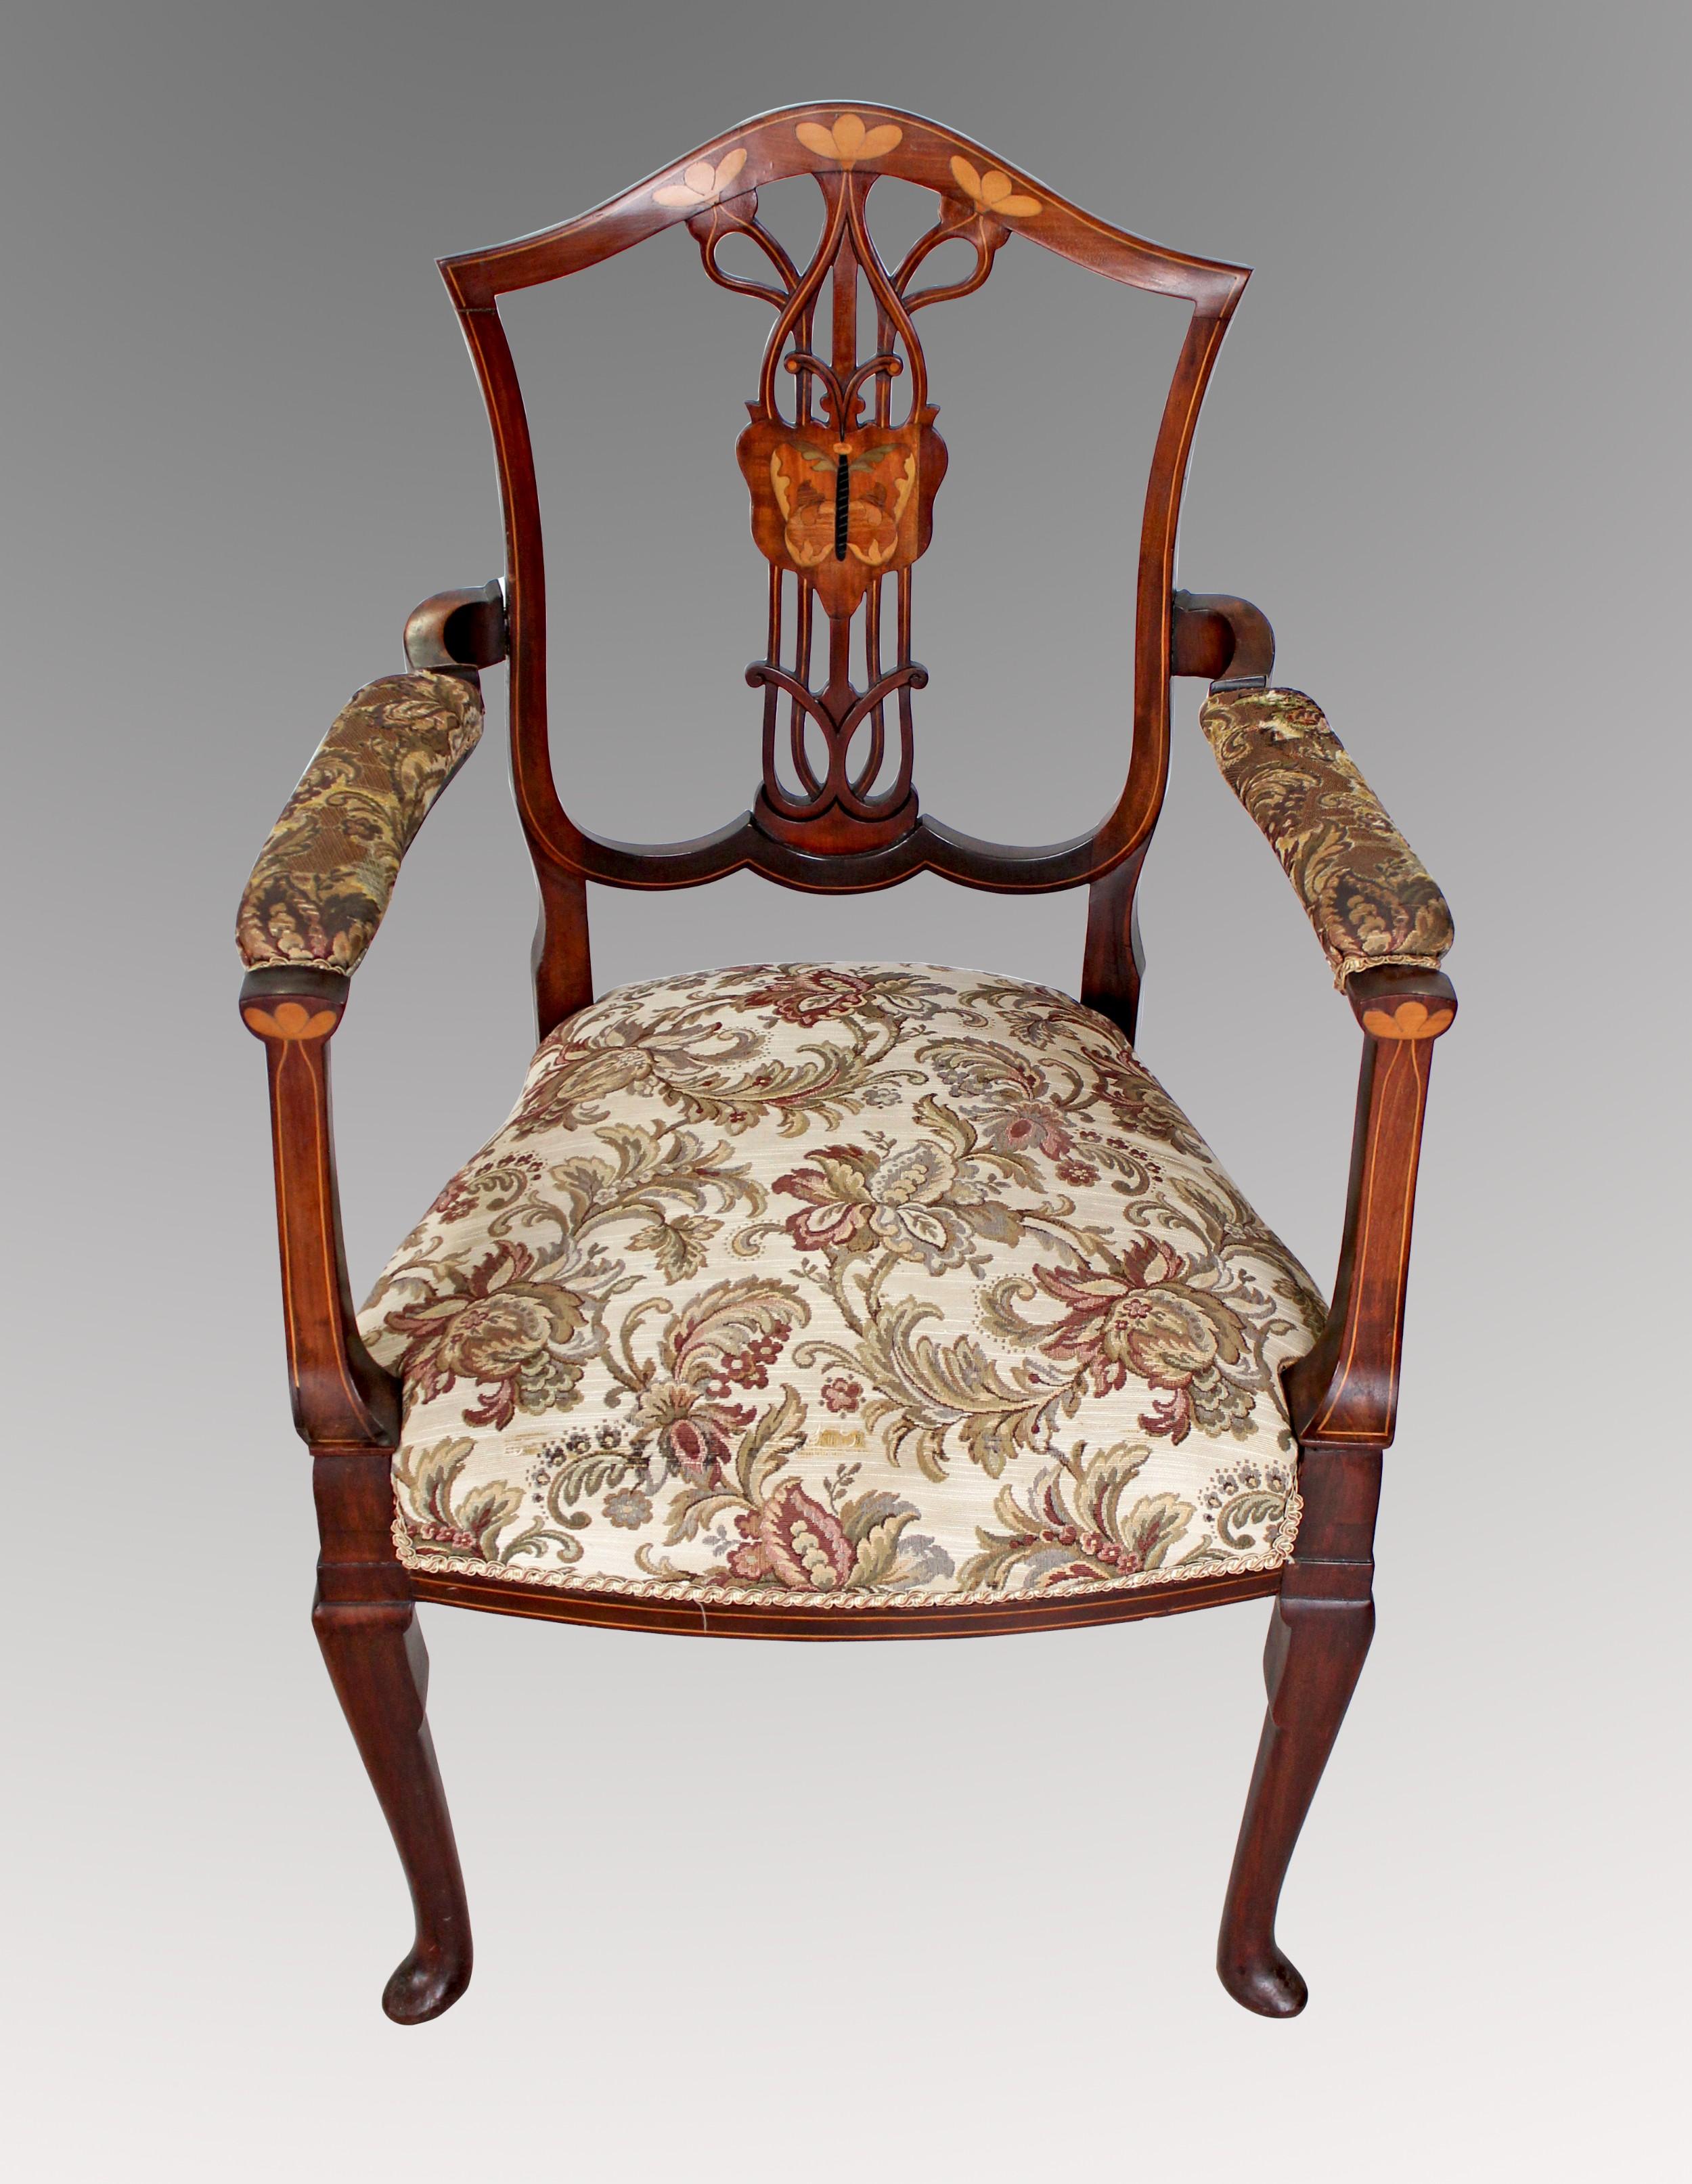 a very pretty art nouveau arm chair